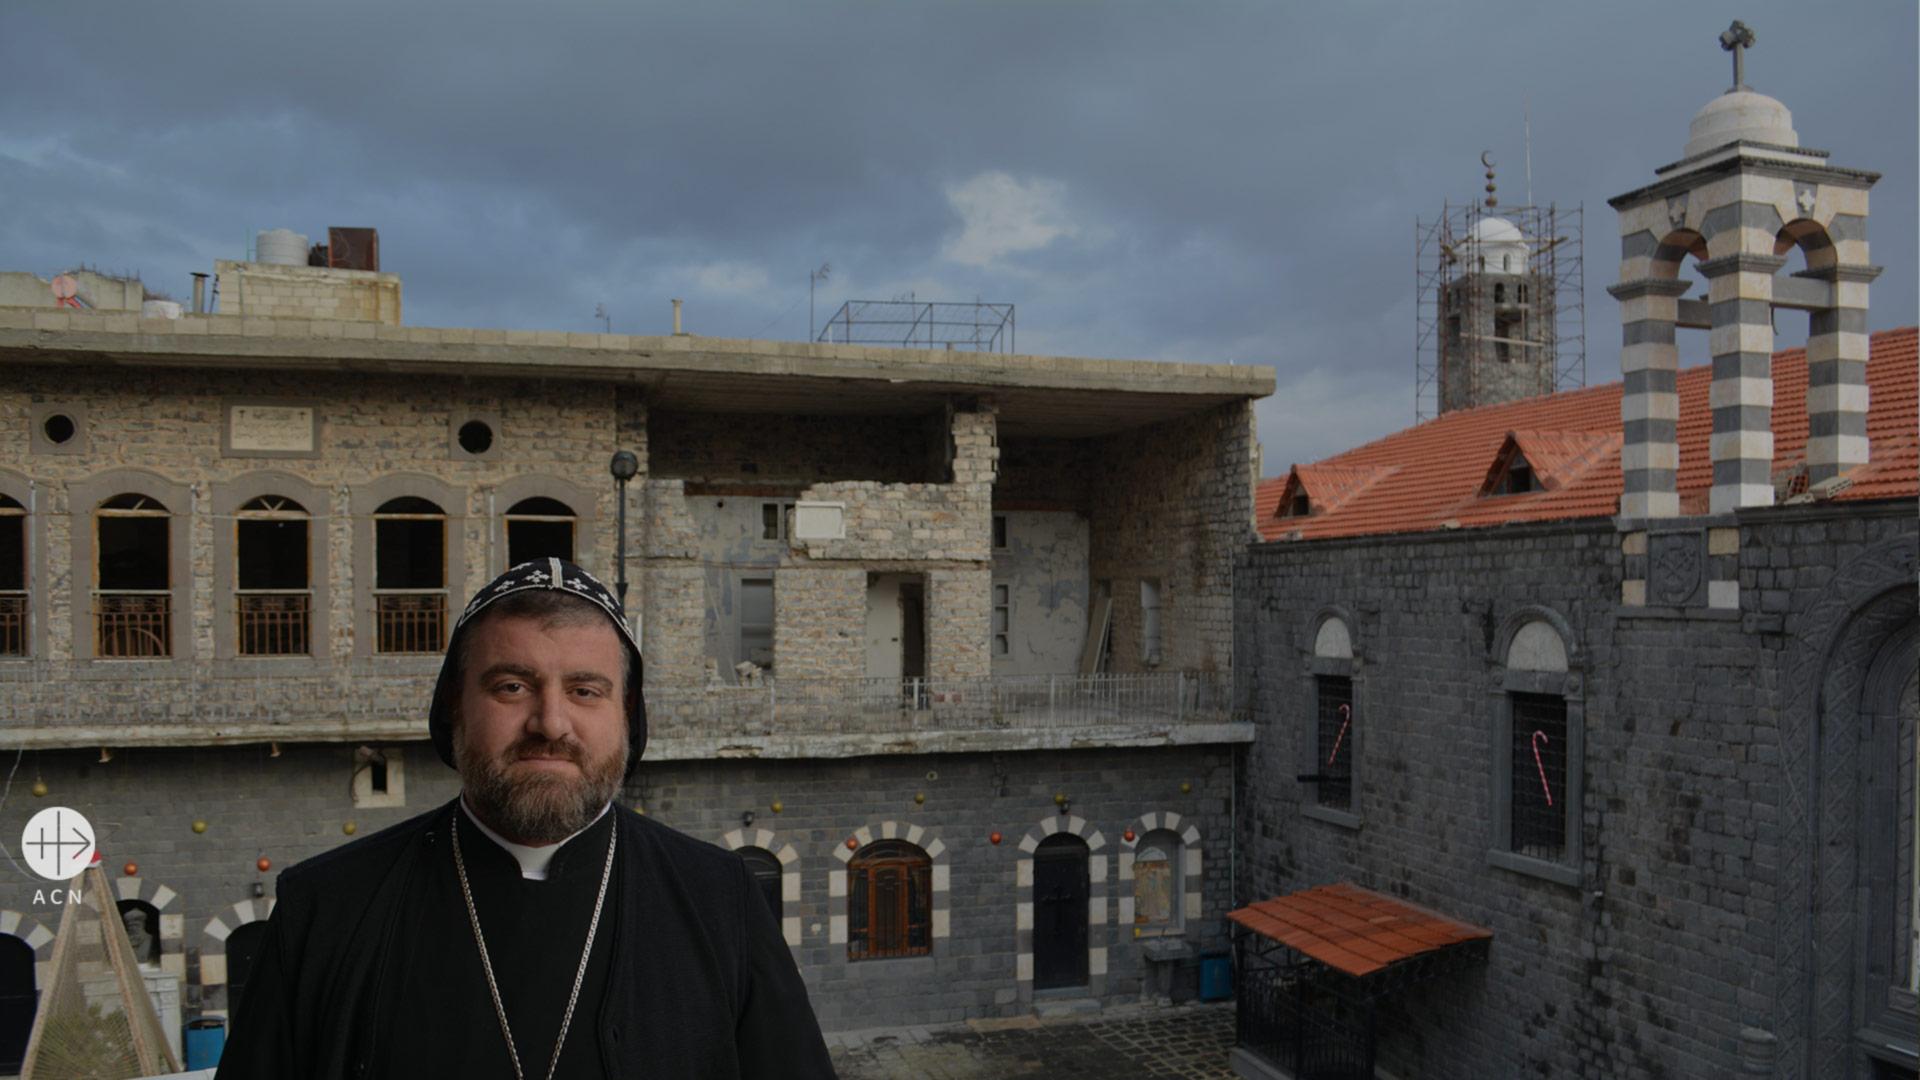 Homs needs new hope